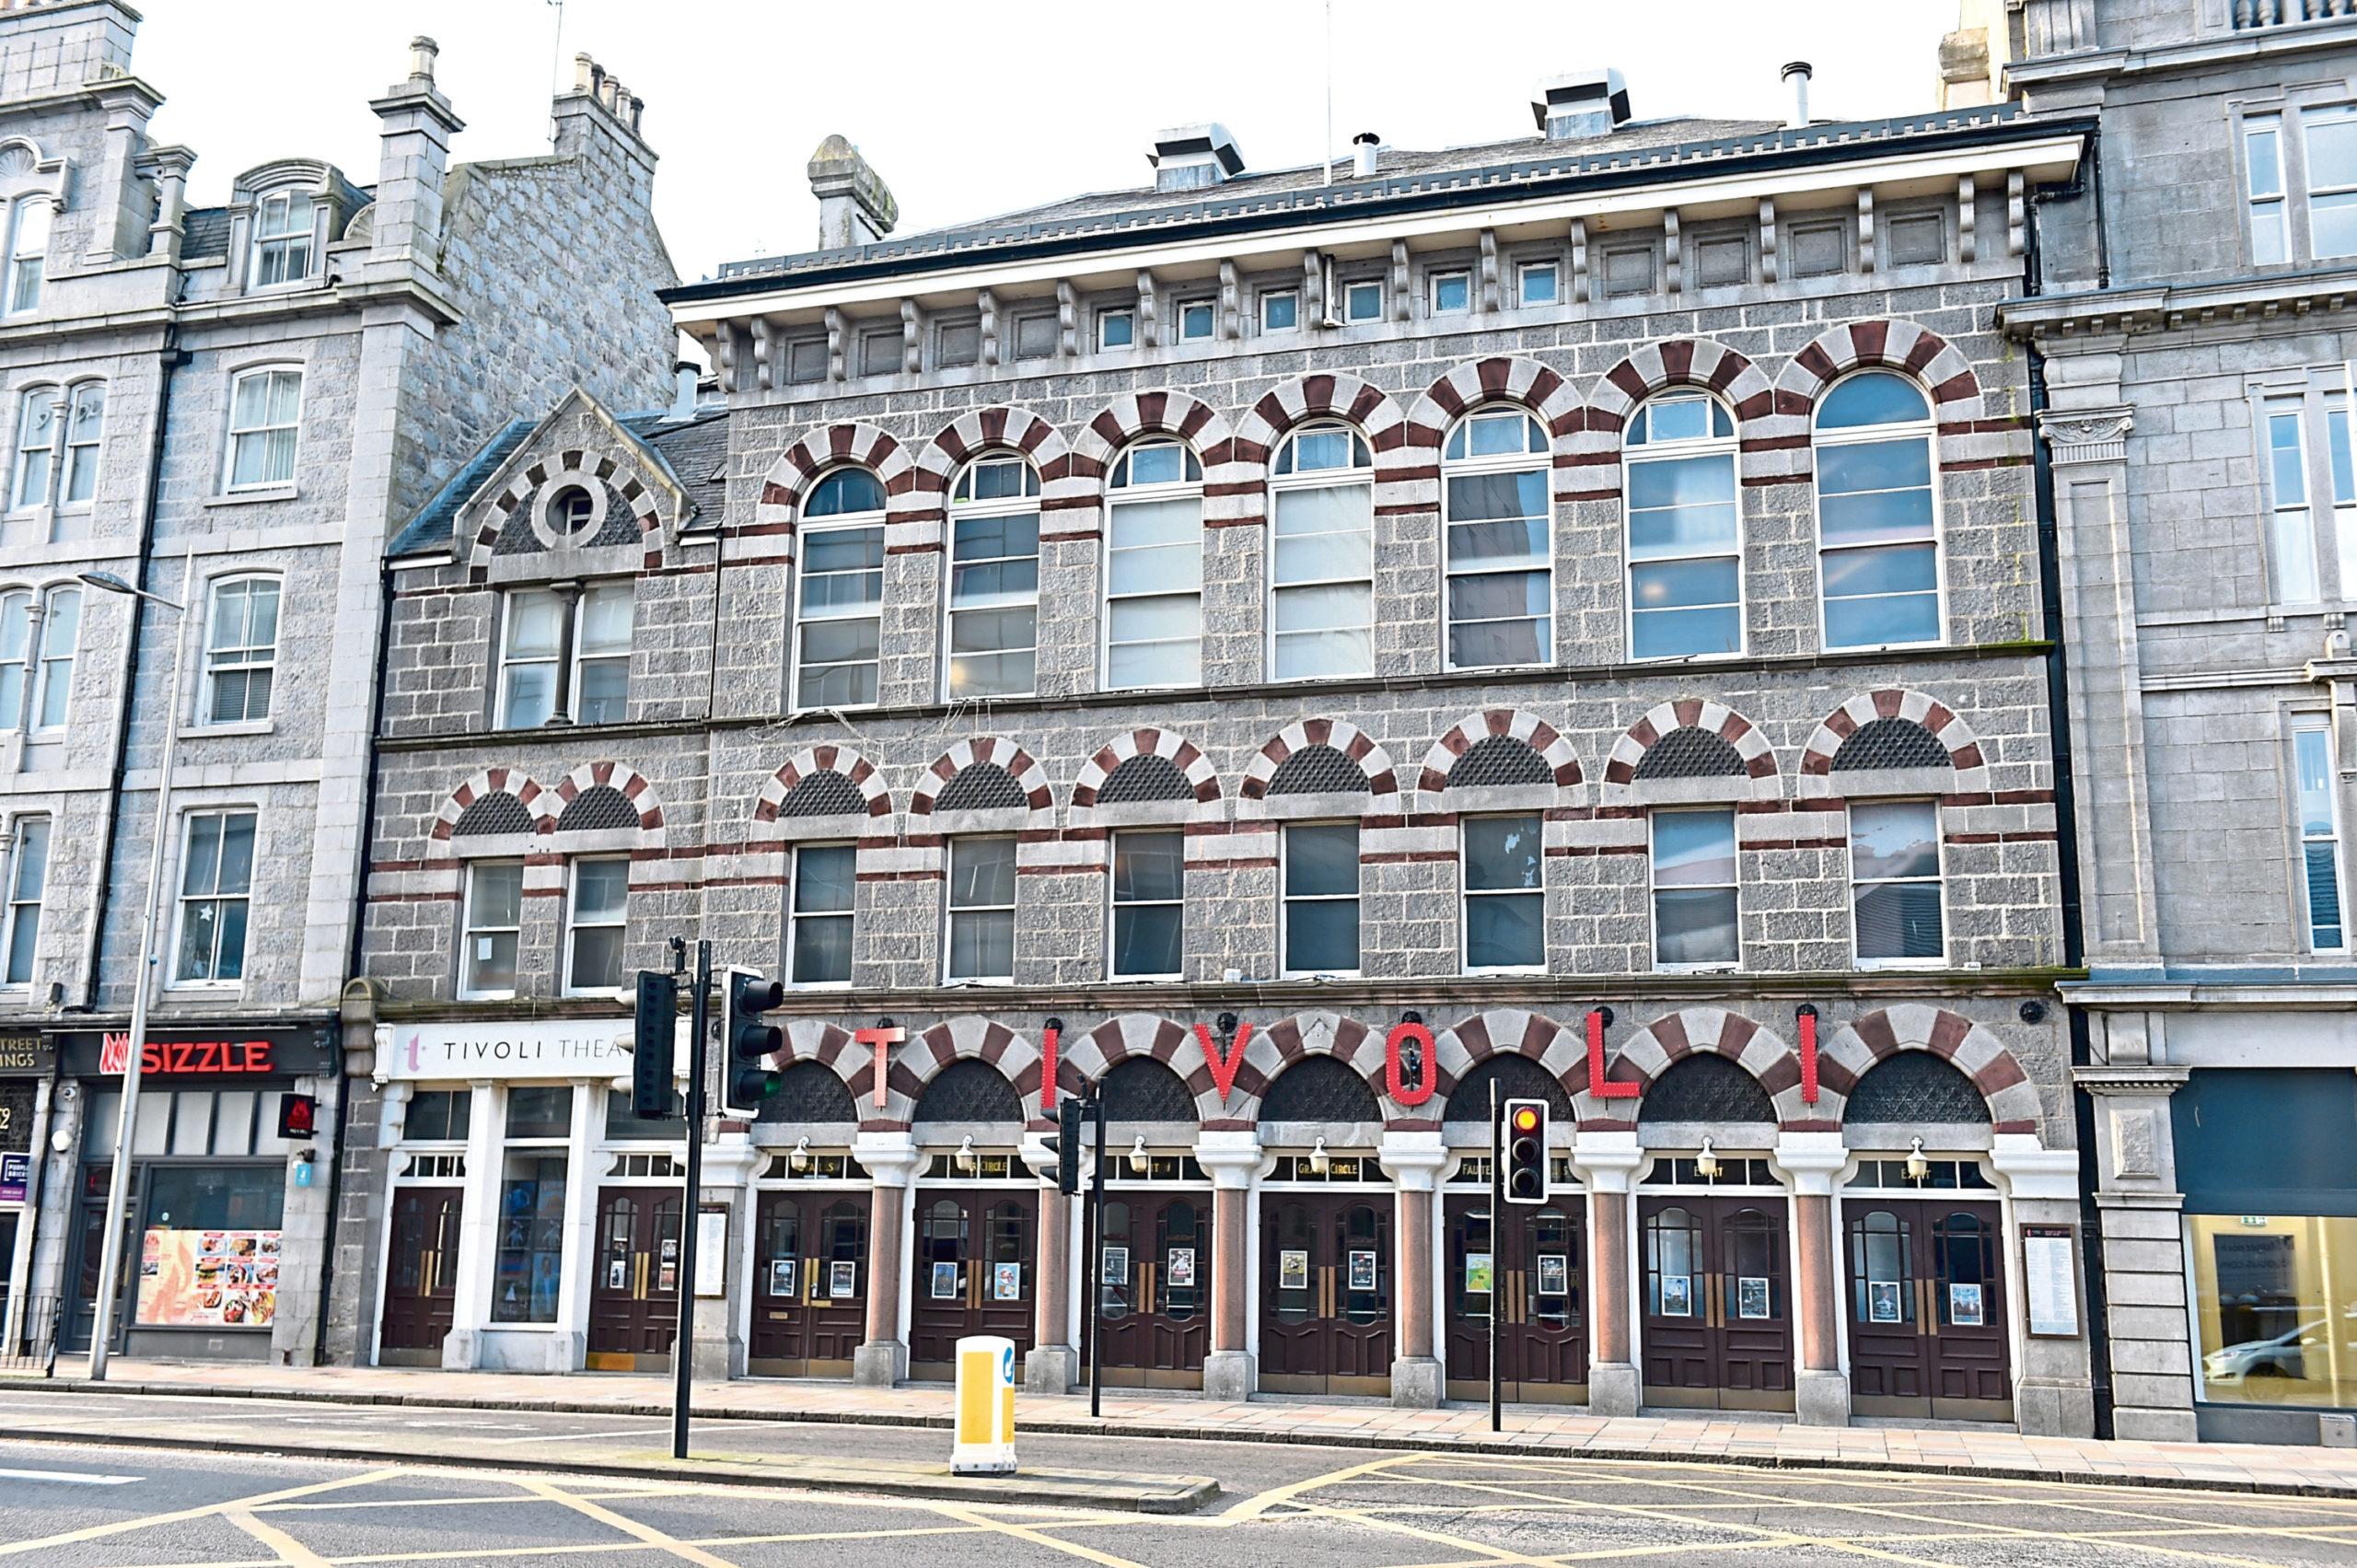 The Tivoli Theatre hopes to raise £5,000